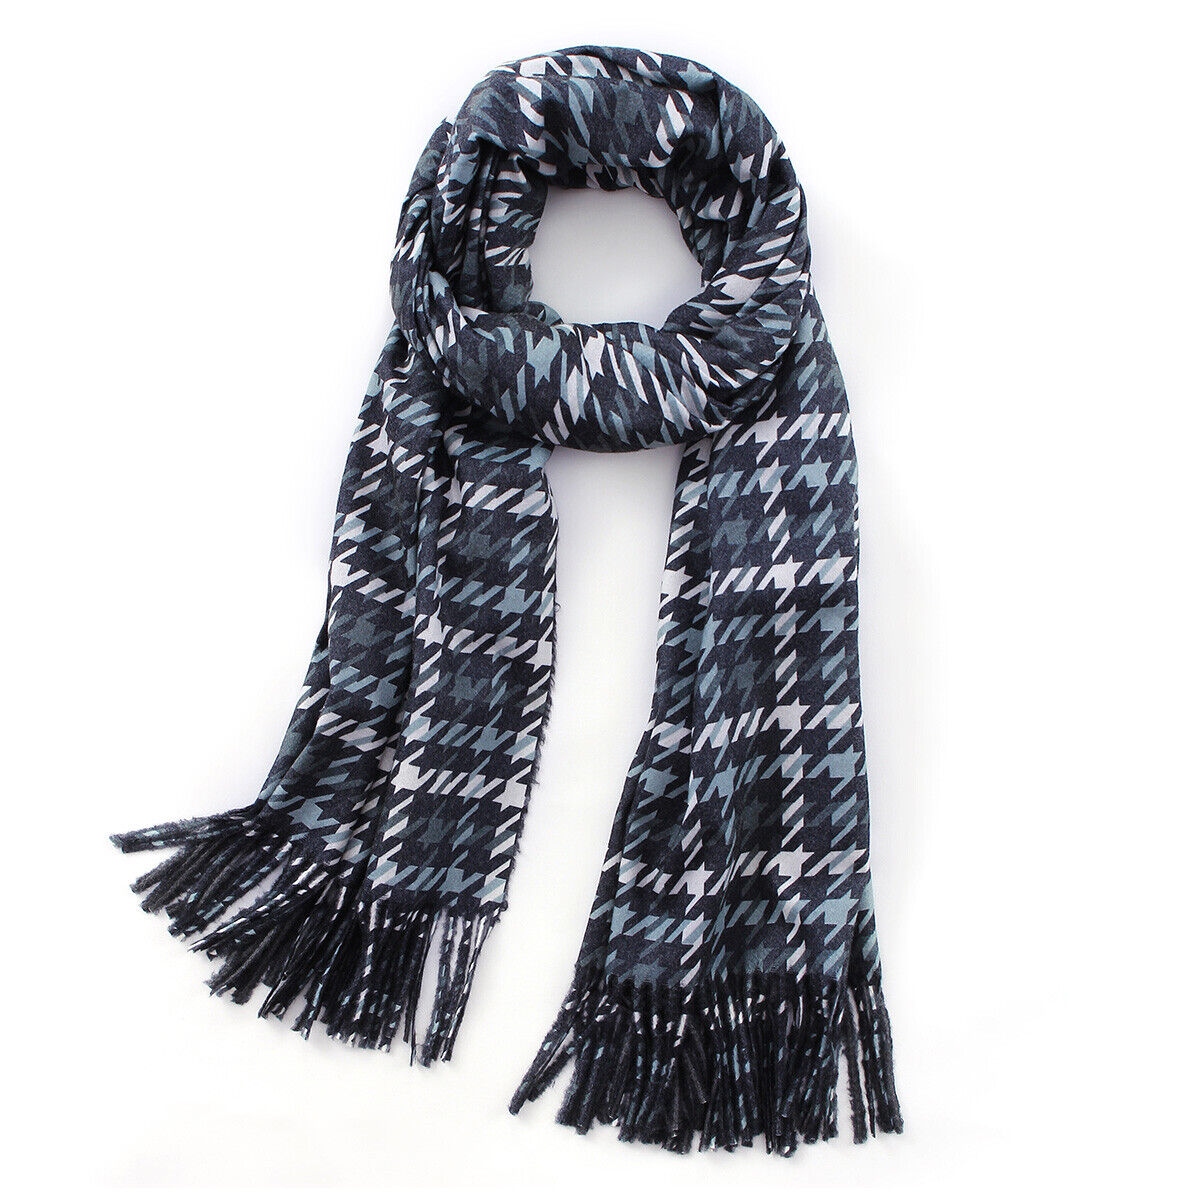 Women Plaid Scarf Neck Warm Large Tartan Wrap Stole Wool Pashmina Tassel Shawl